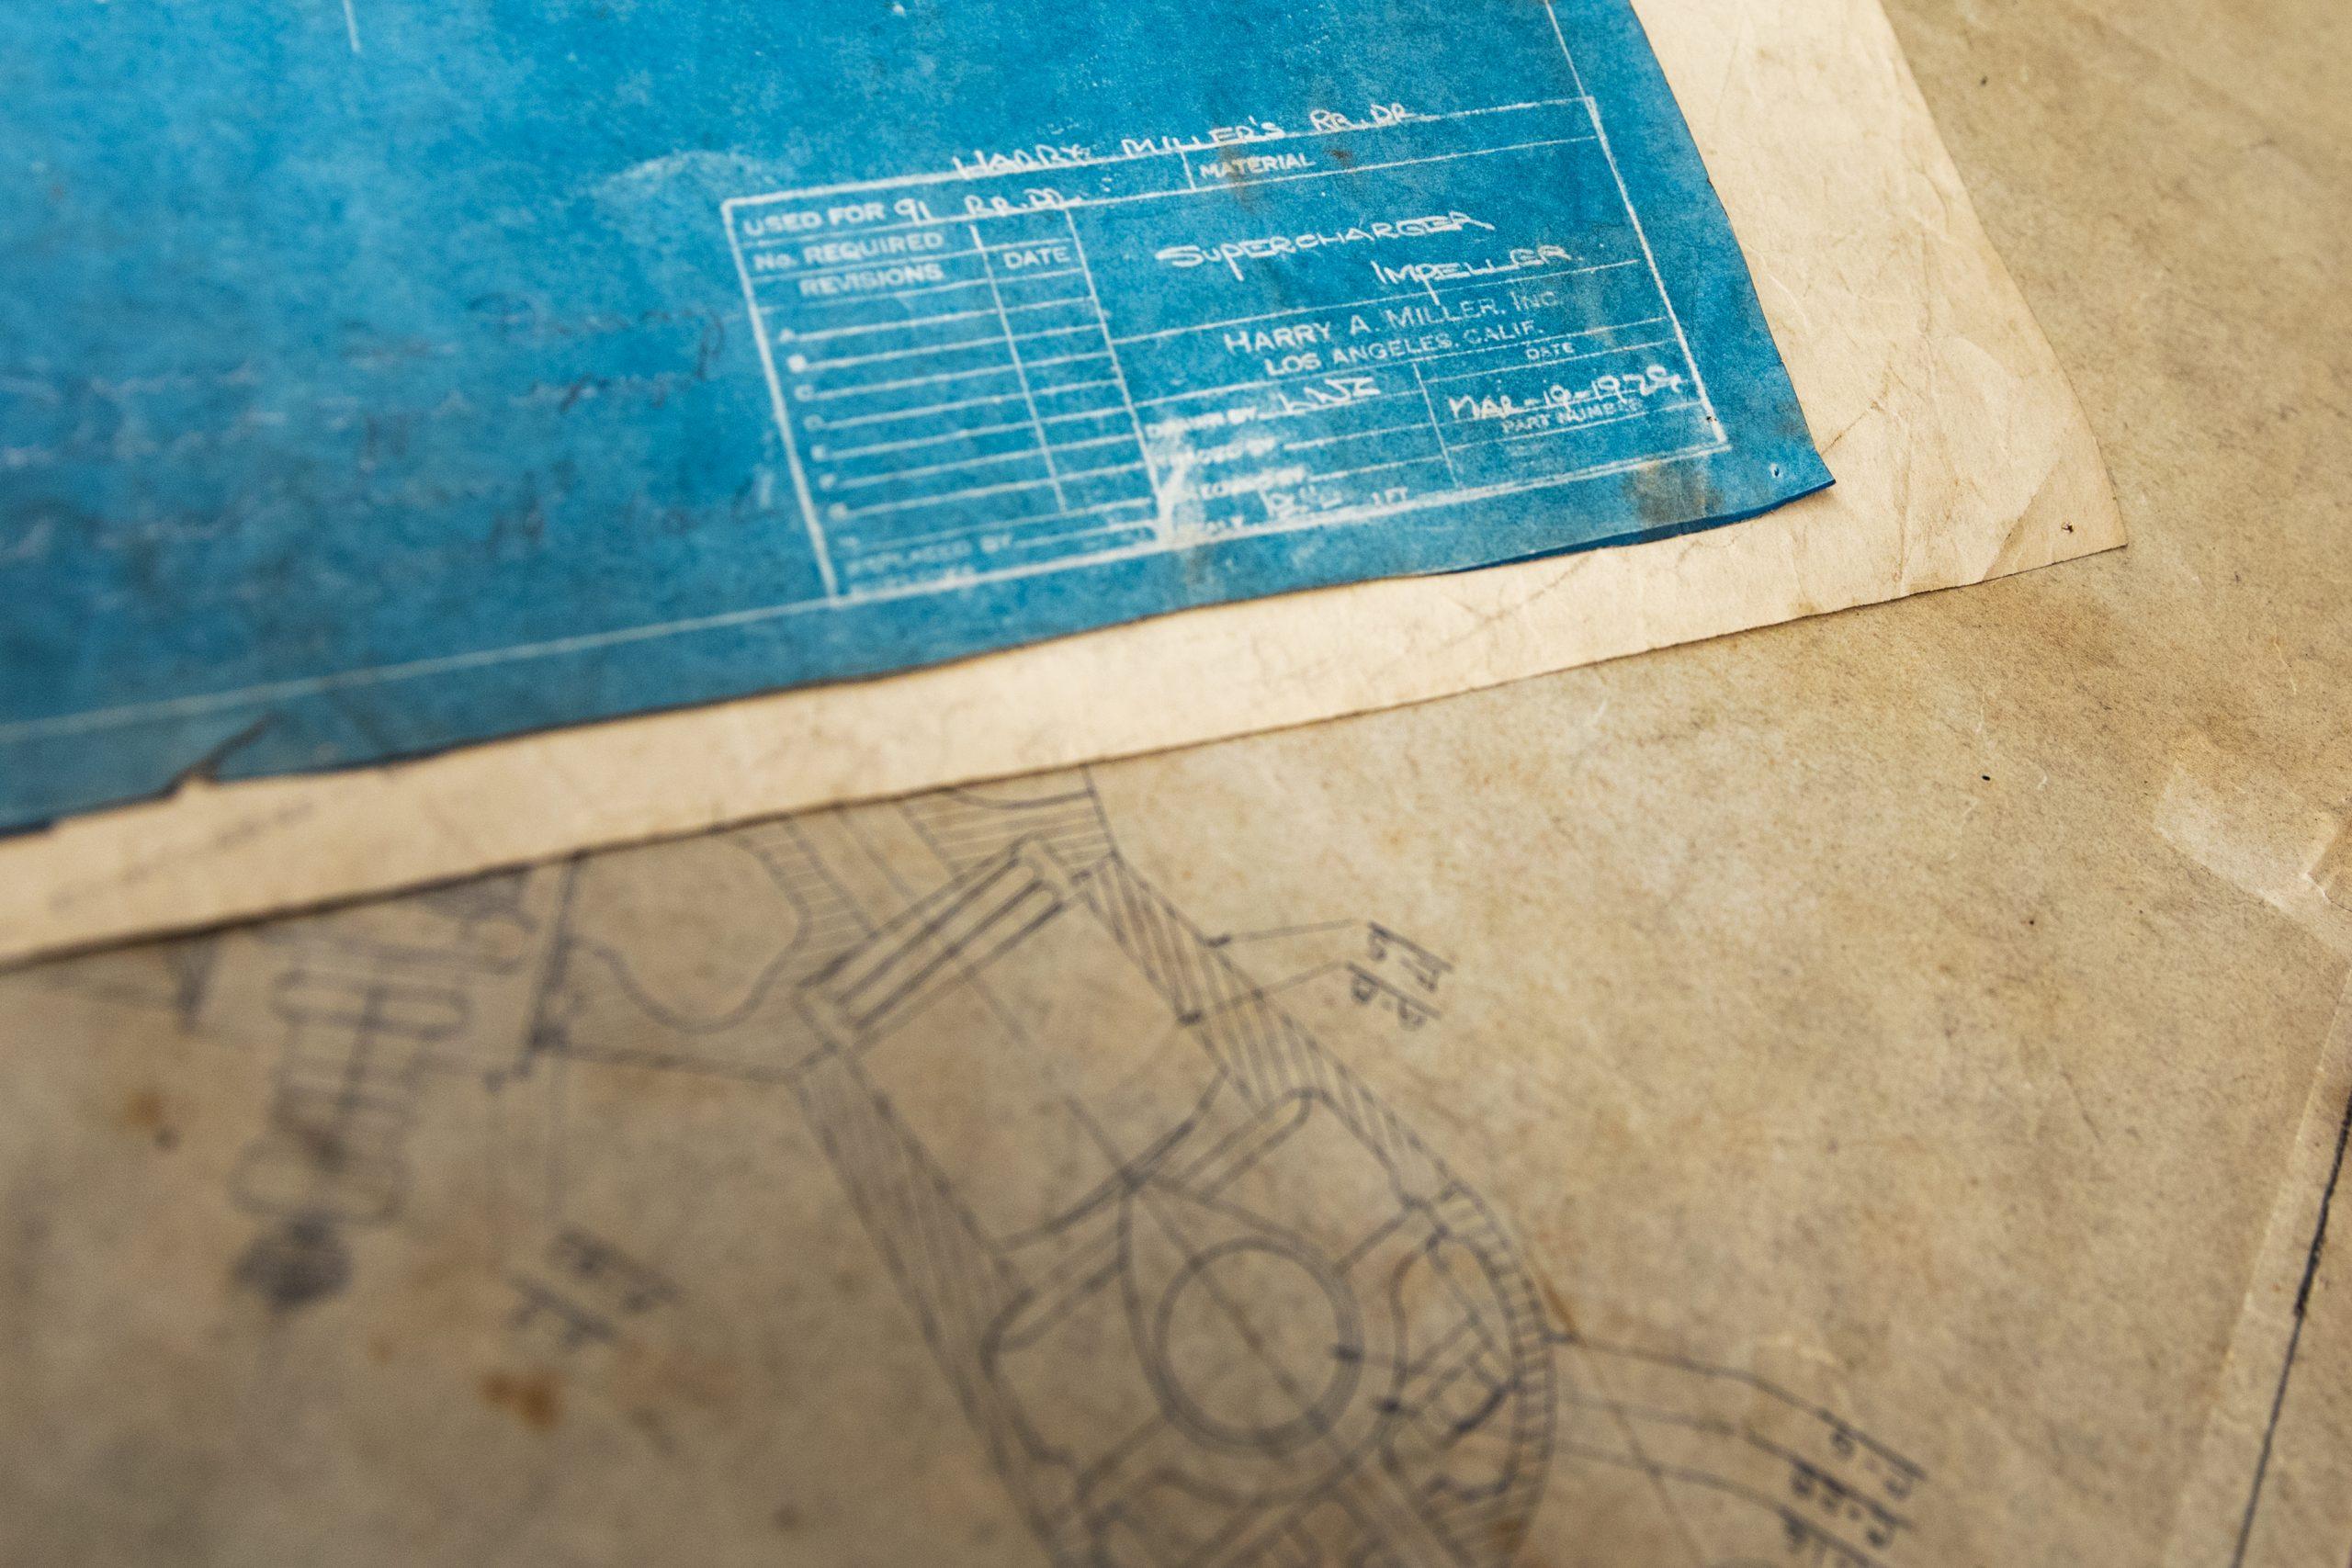 machine shop historical drawing drafts